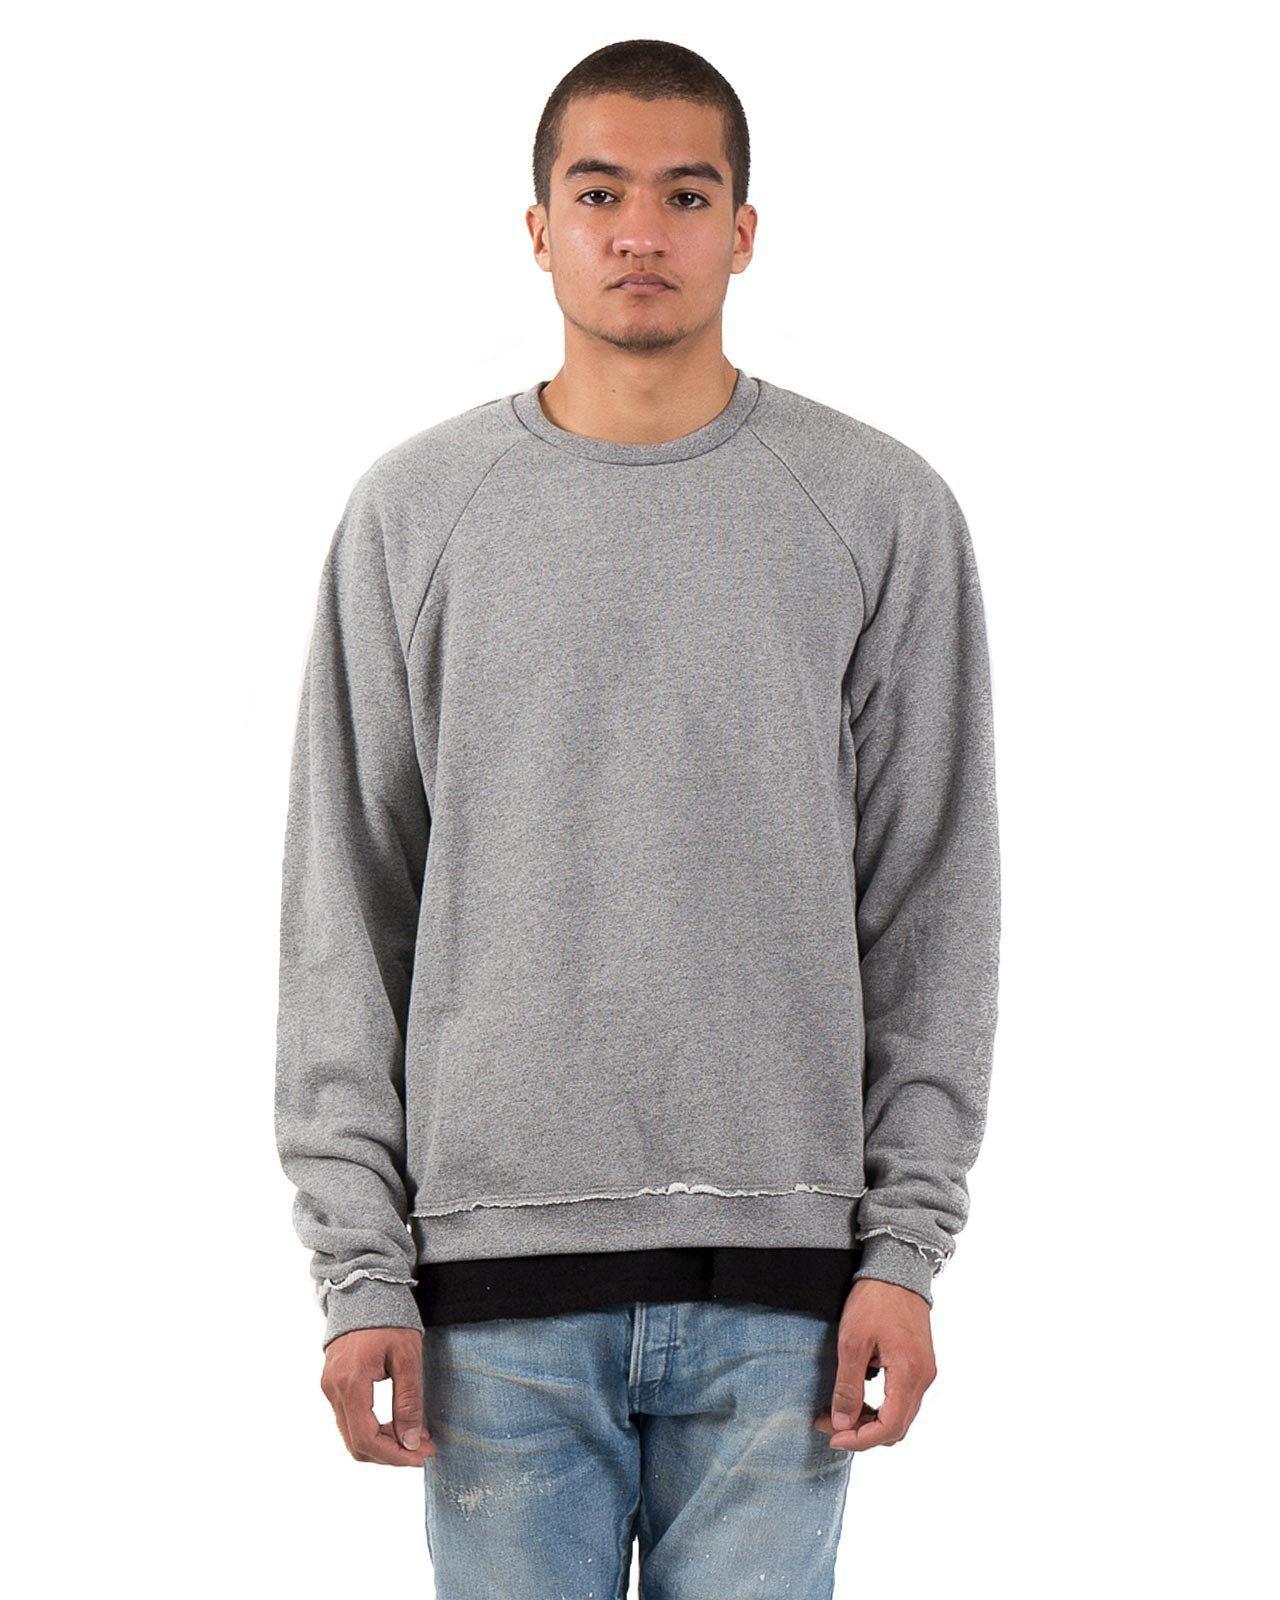 Raw Edge Raglan Crew In Dark Gray John Elliott Crew Neck Sweatshirt Raglan Men Sweater [ 1600 x 1280 Pixel ]